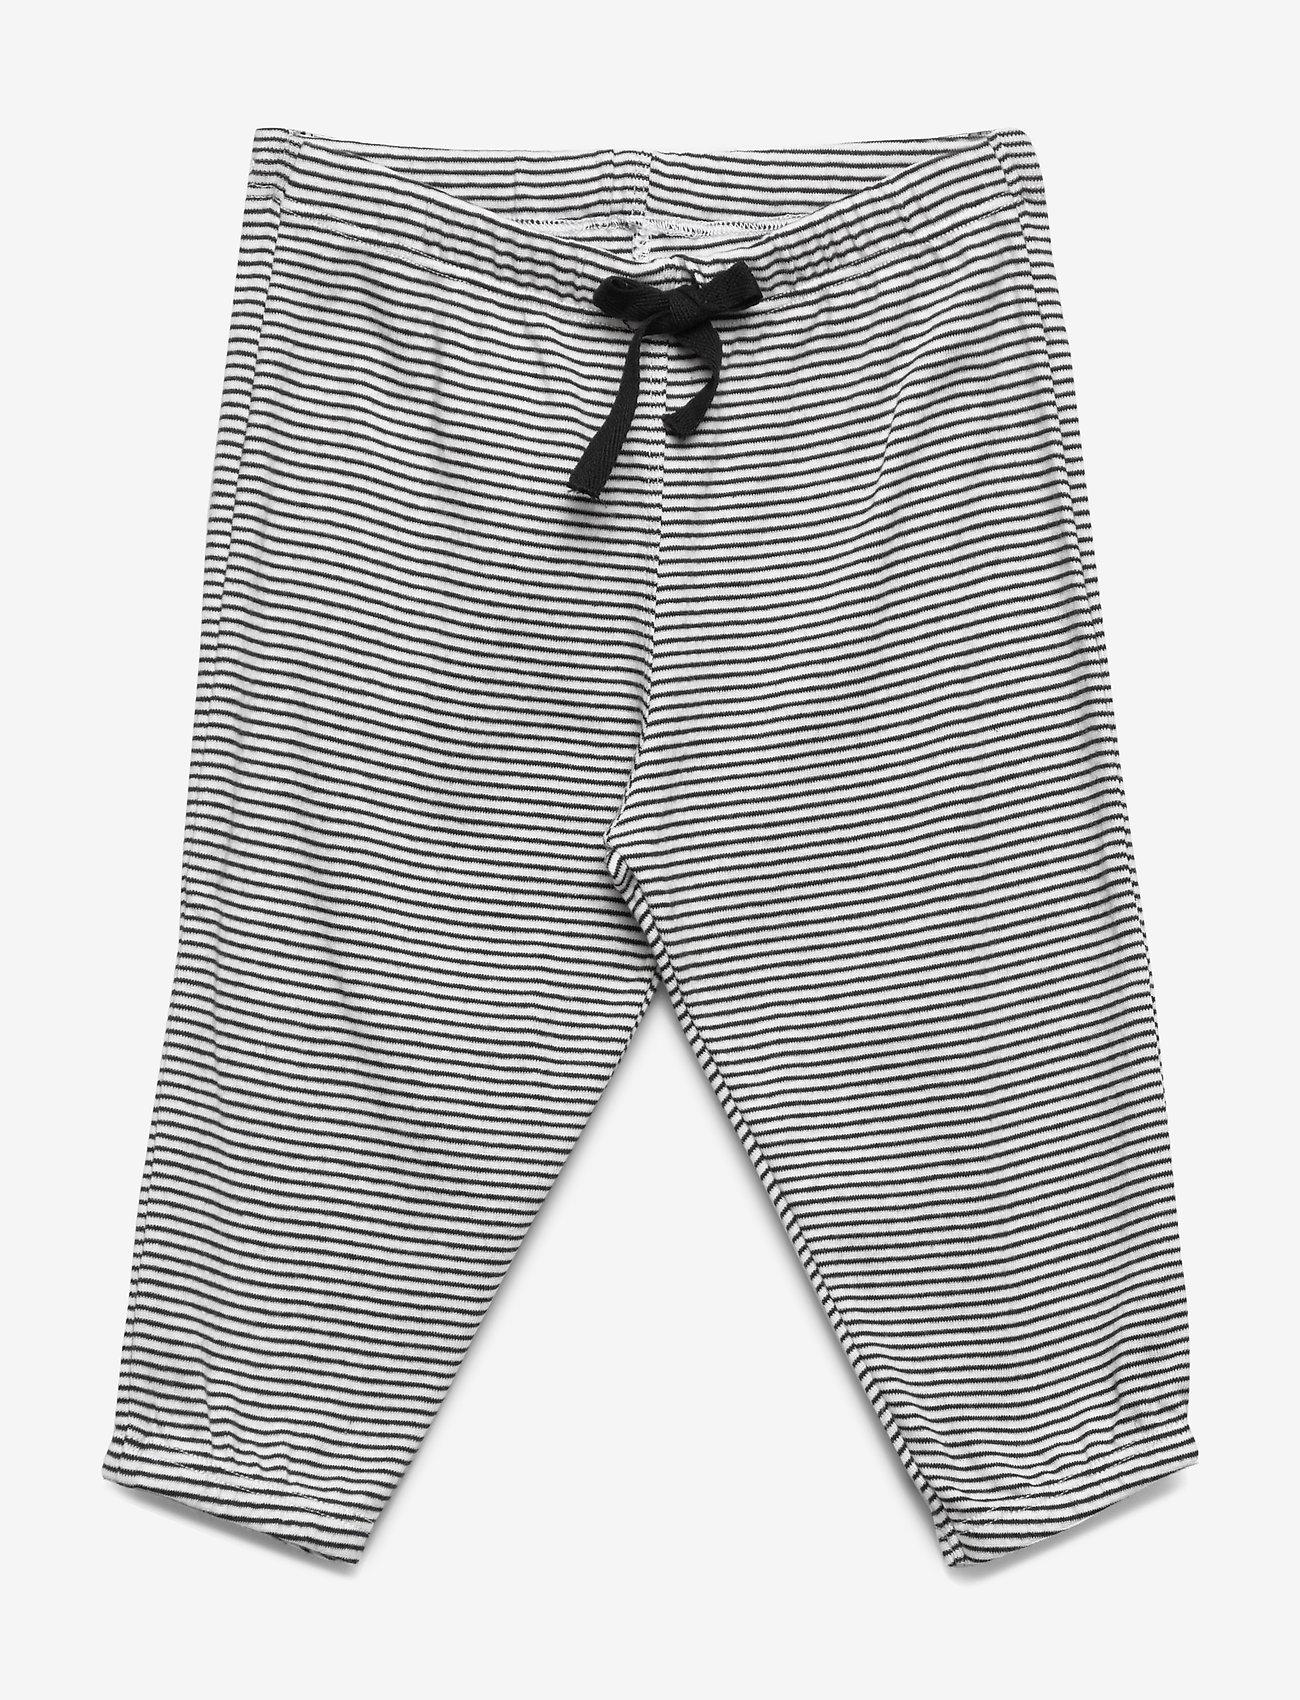 Noa Noa Miniature - Trousers - sweatpants - black - 0